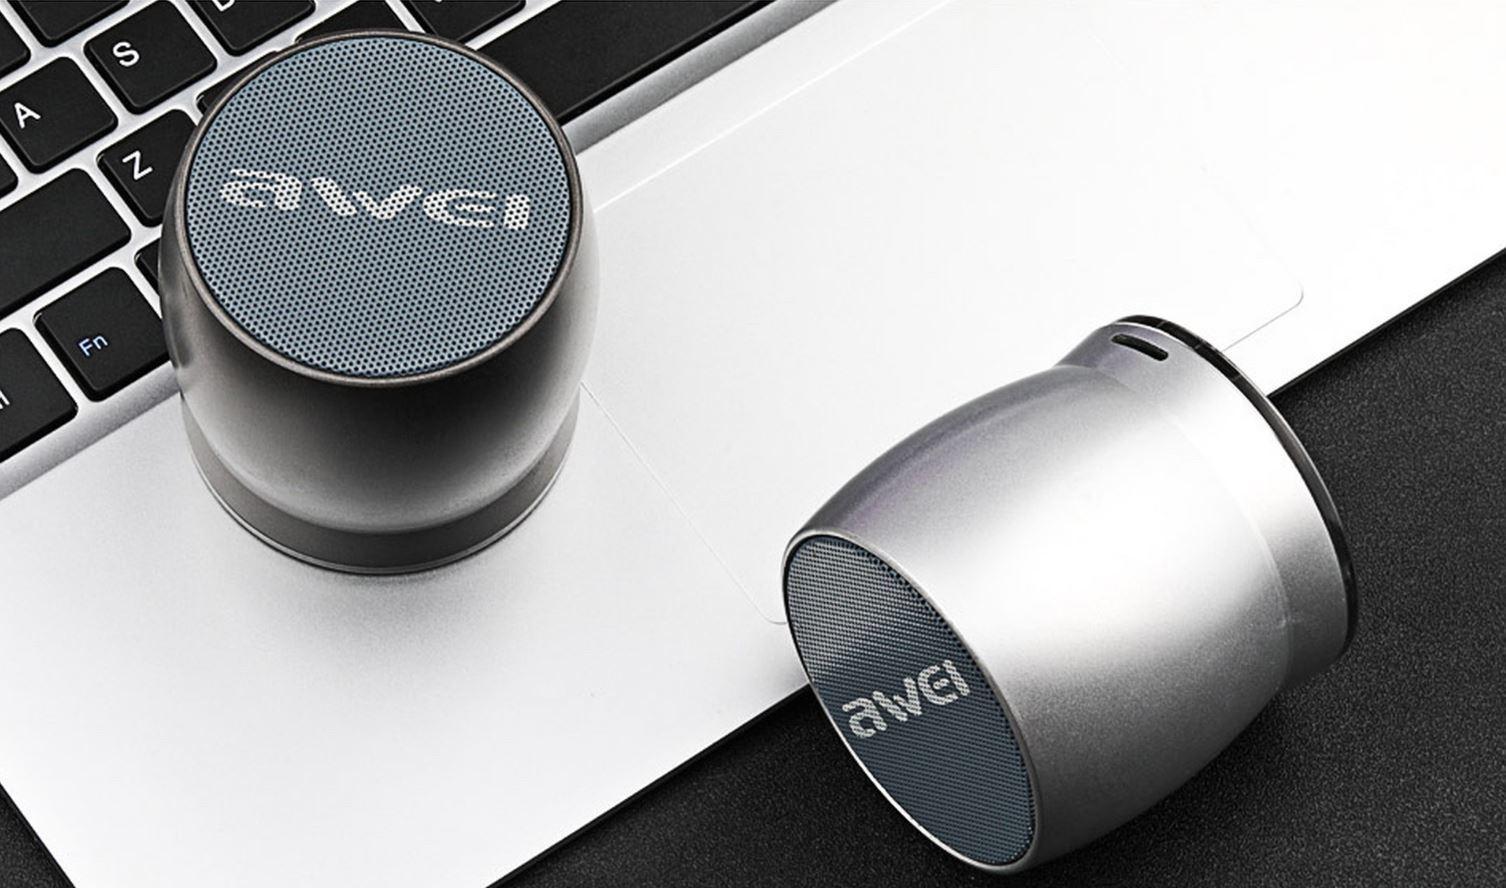 Awei y500 speaker зарна. Үнэ: 70,000₮ Утас: 80001100